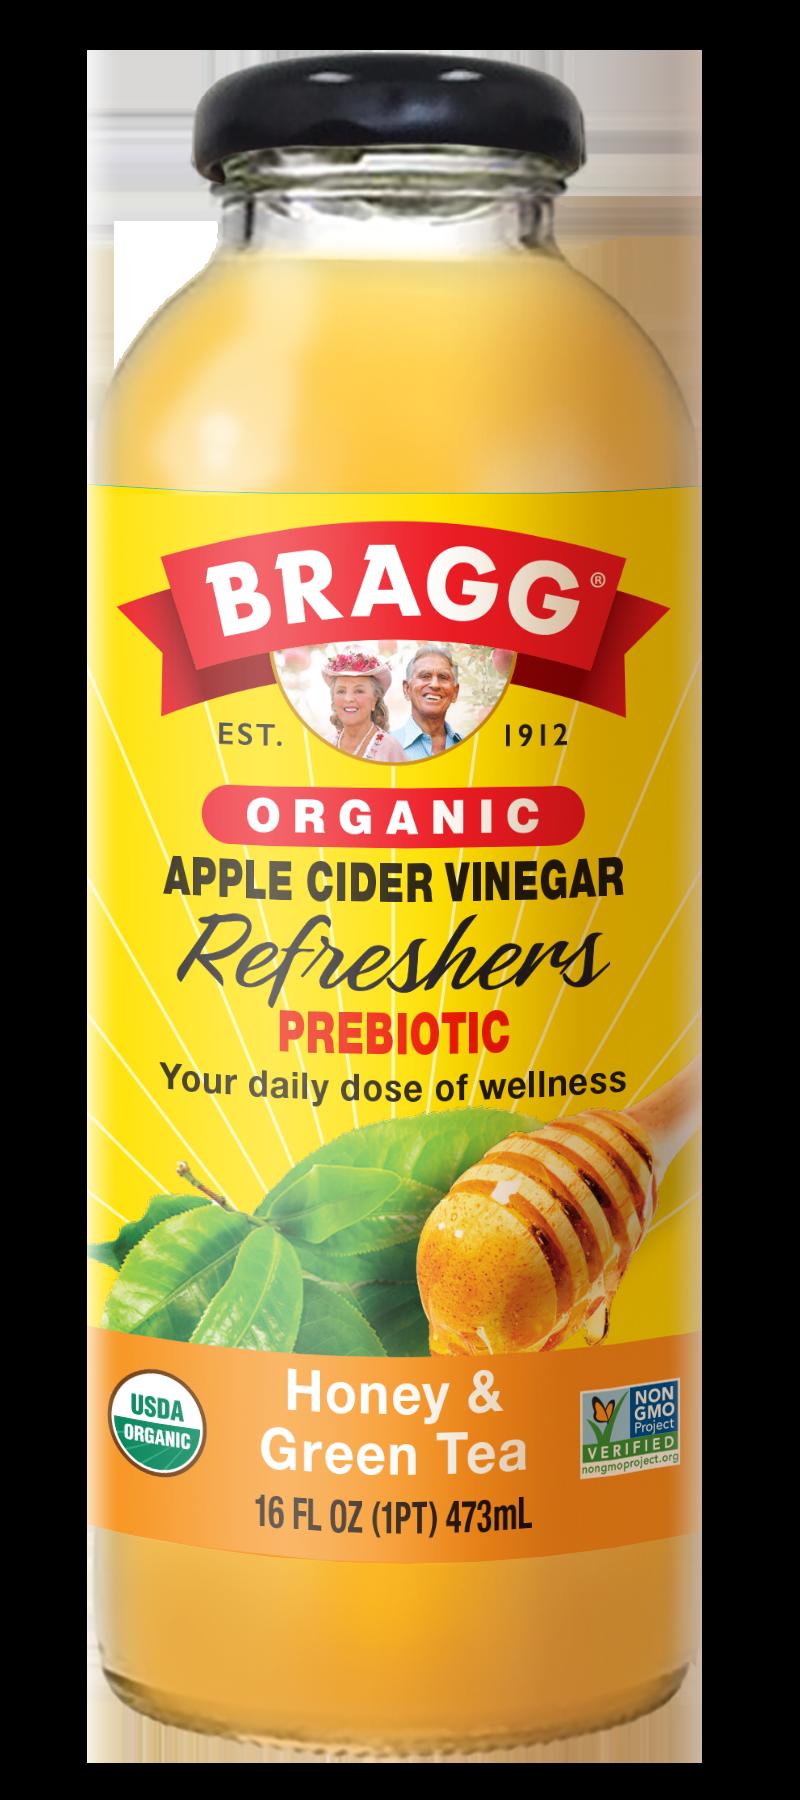 Bragg Apple Cider Vinegar Refreshers